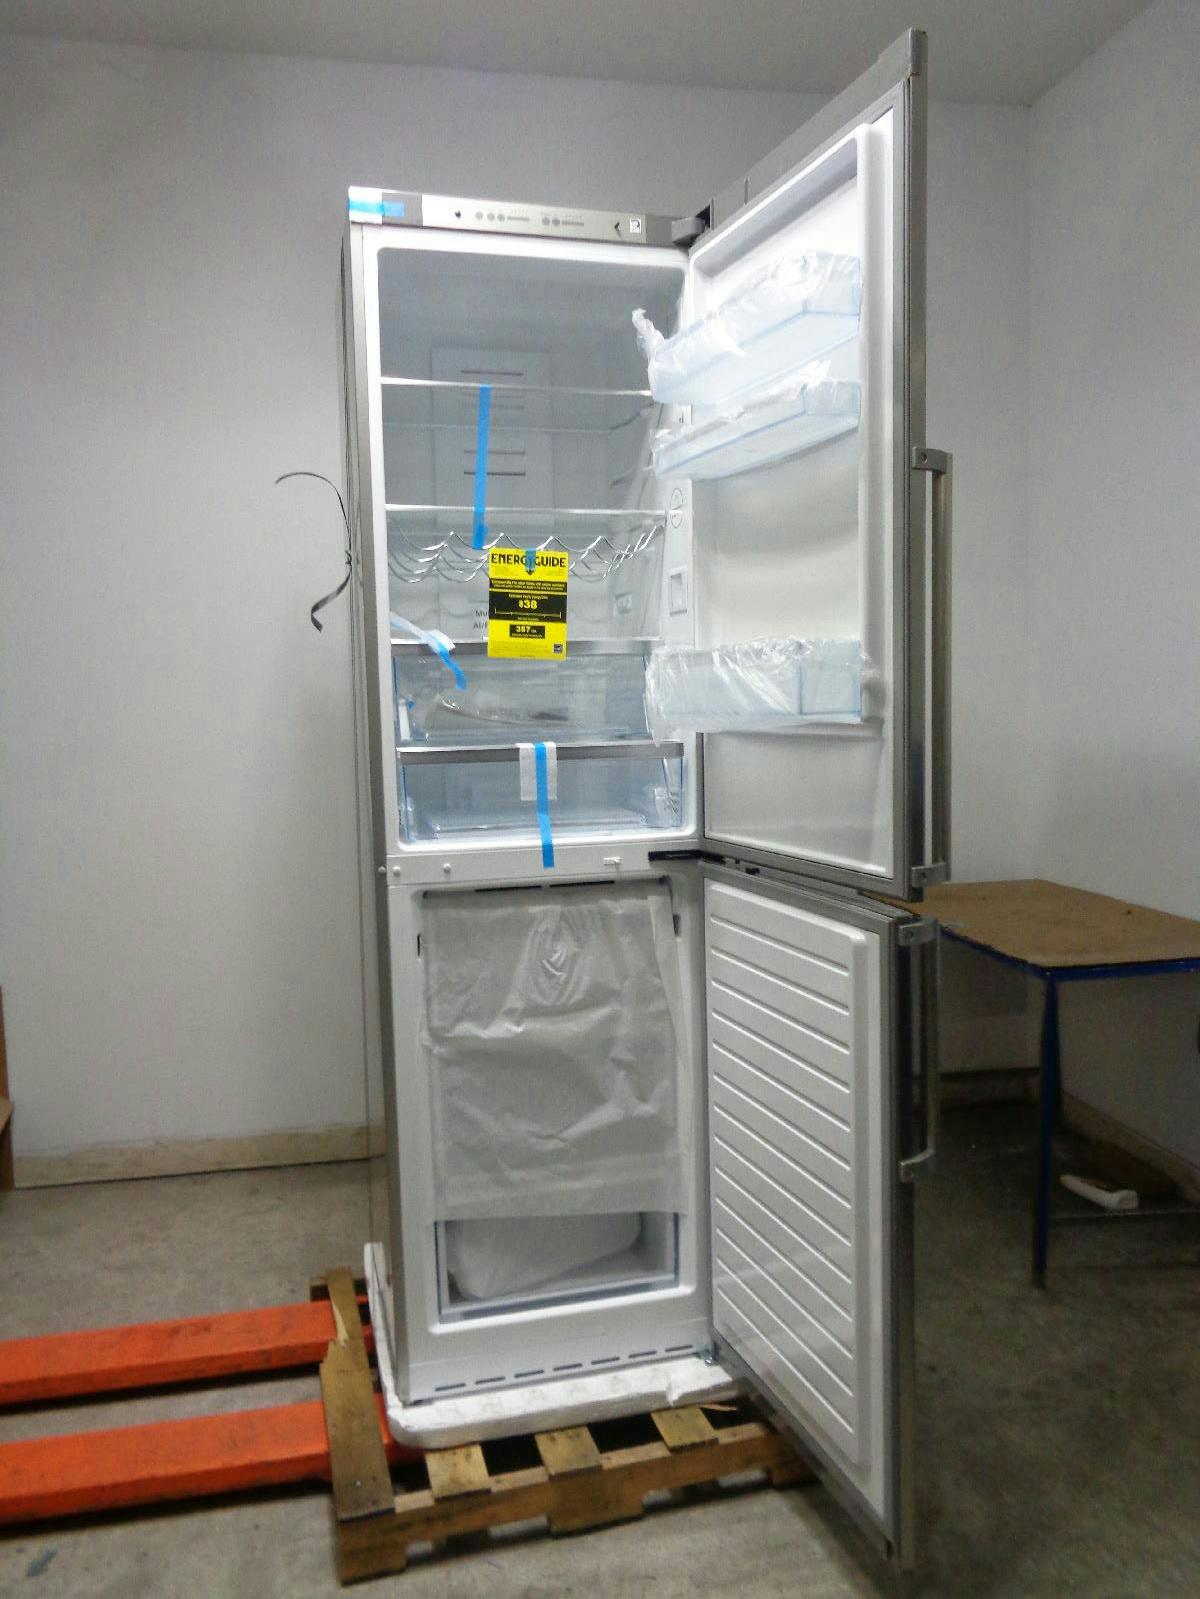 Bottom Freezer Refrigerators: Counter Depth &